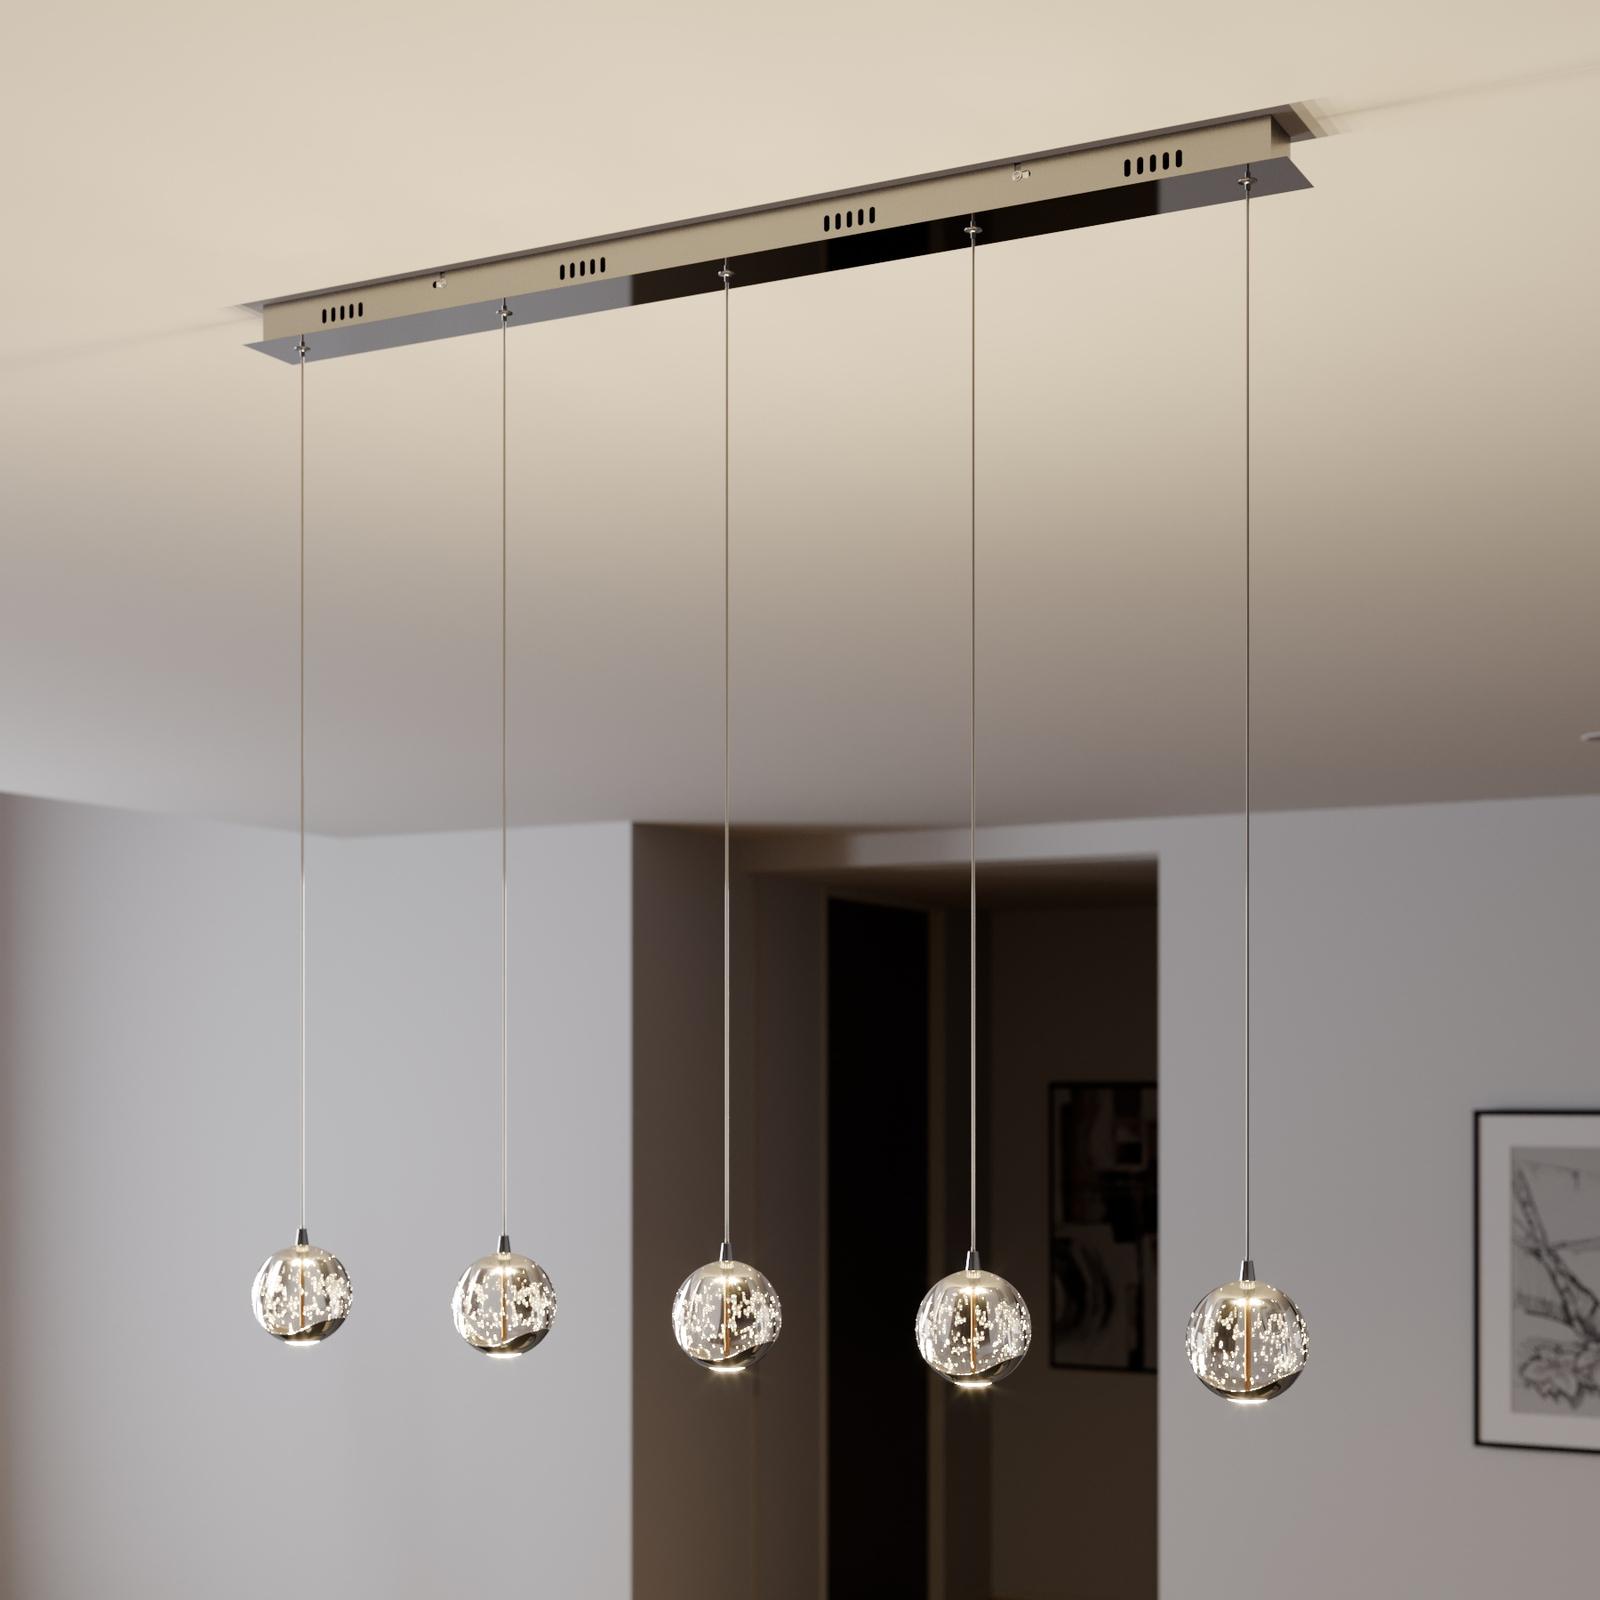 LED hanglamp Hayley, 5-lamps, langwerpig, chroom